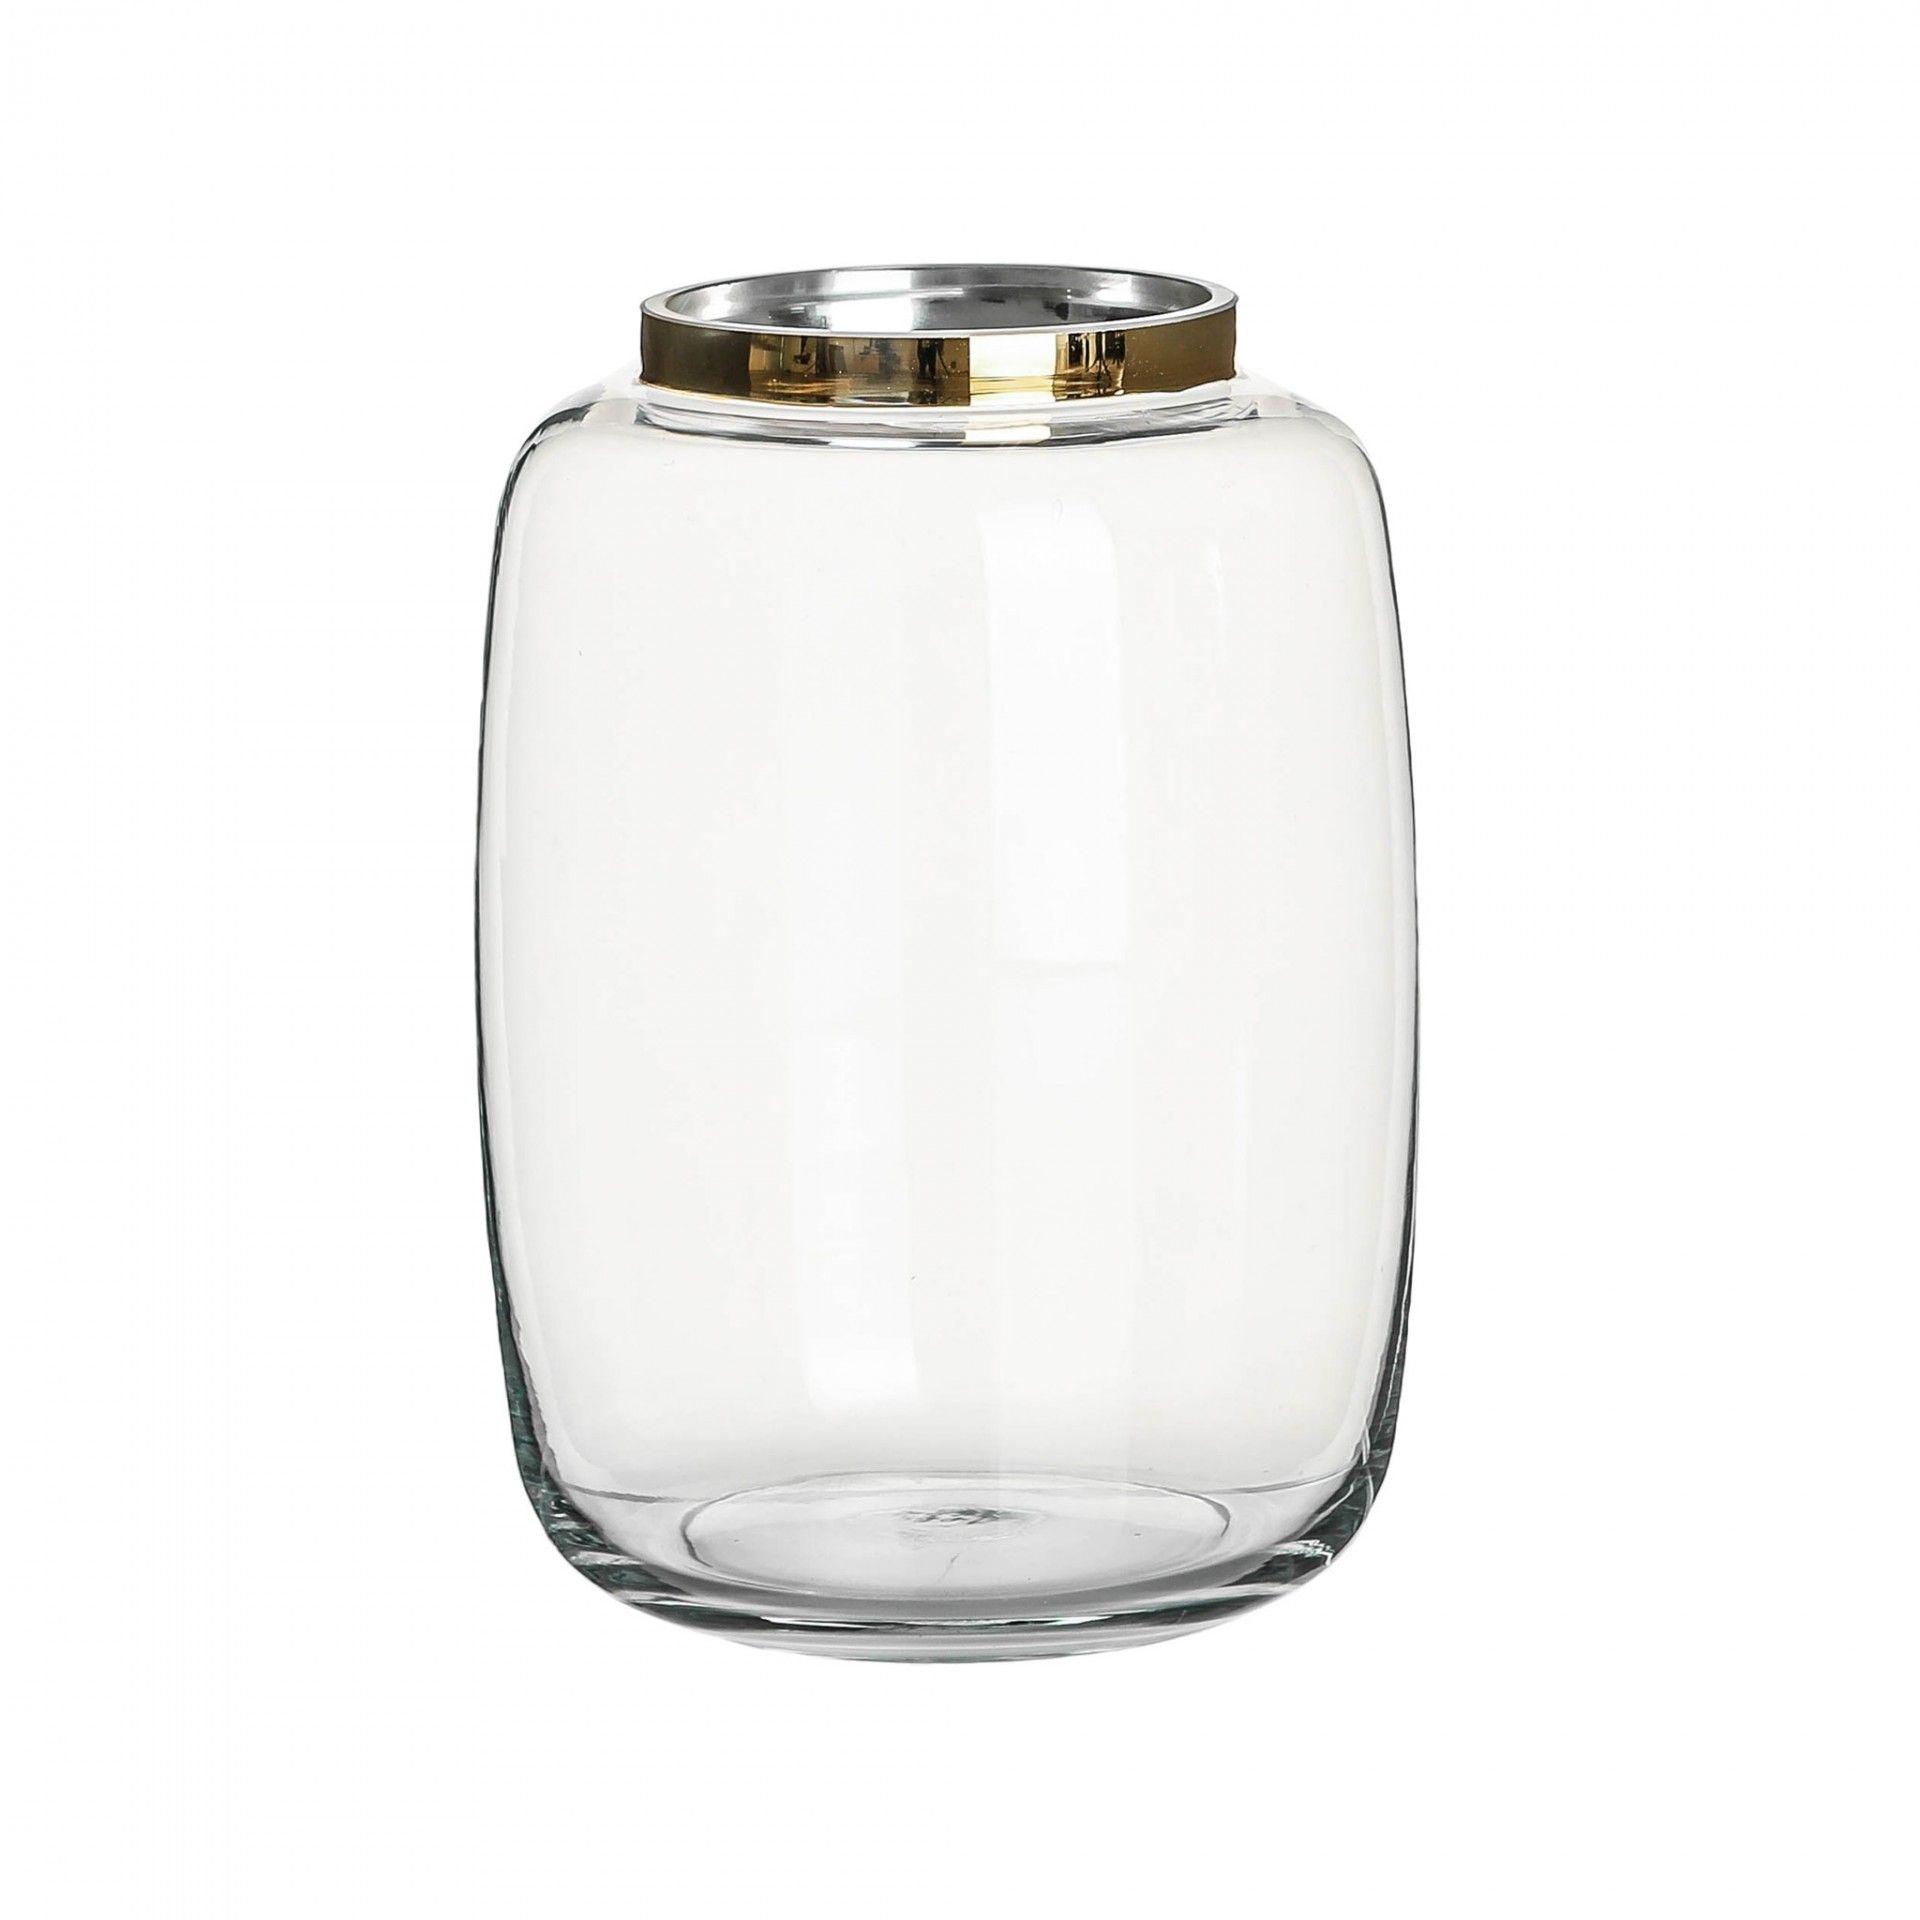 Jarrão elegance em vidro | Moviflor